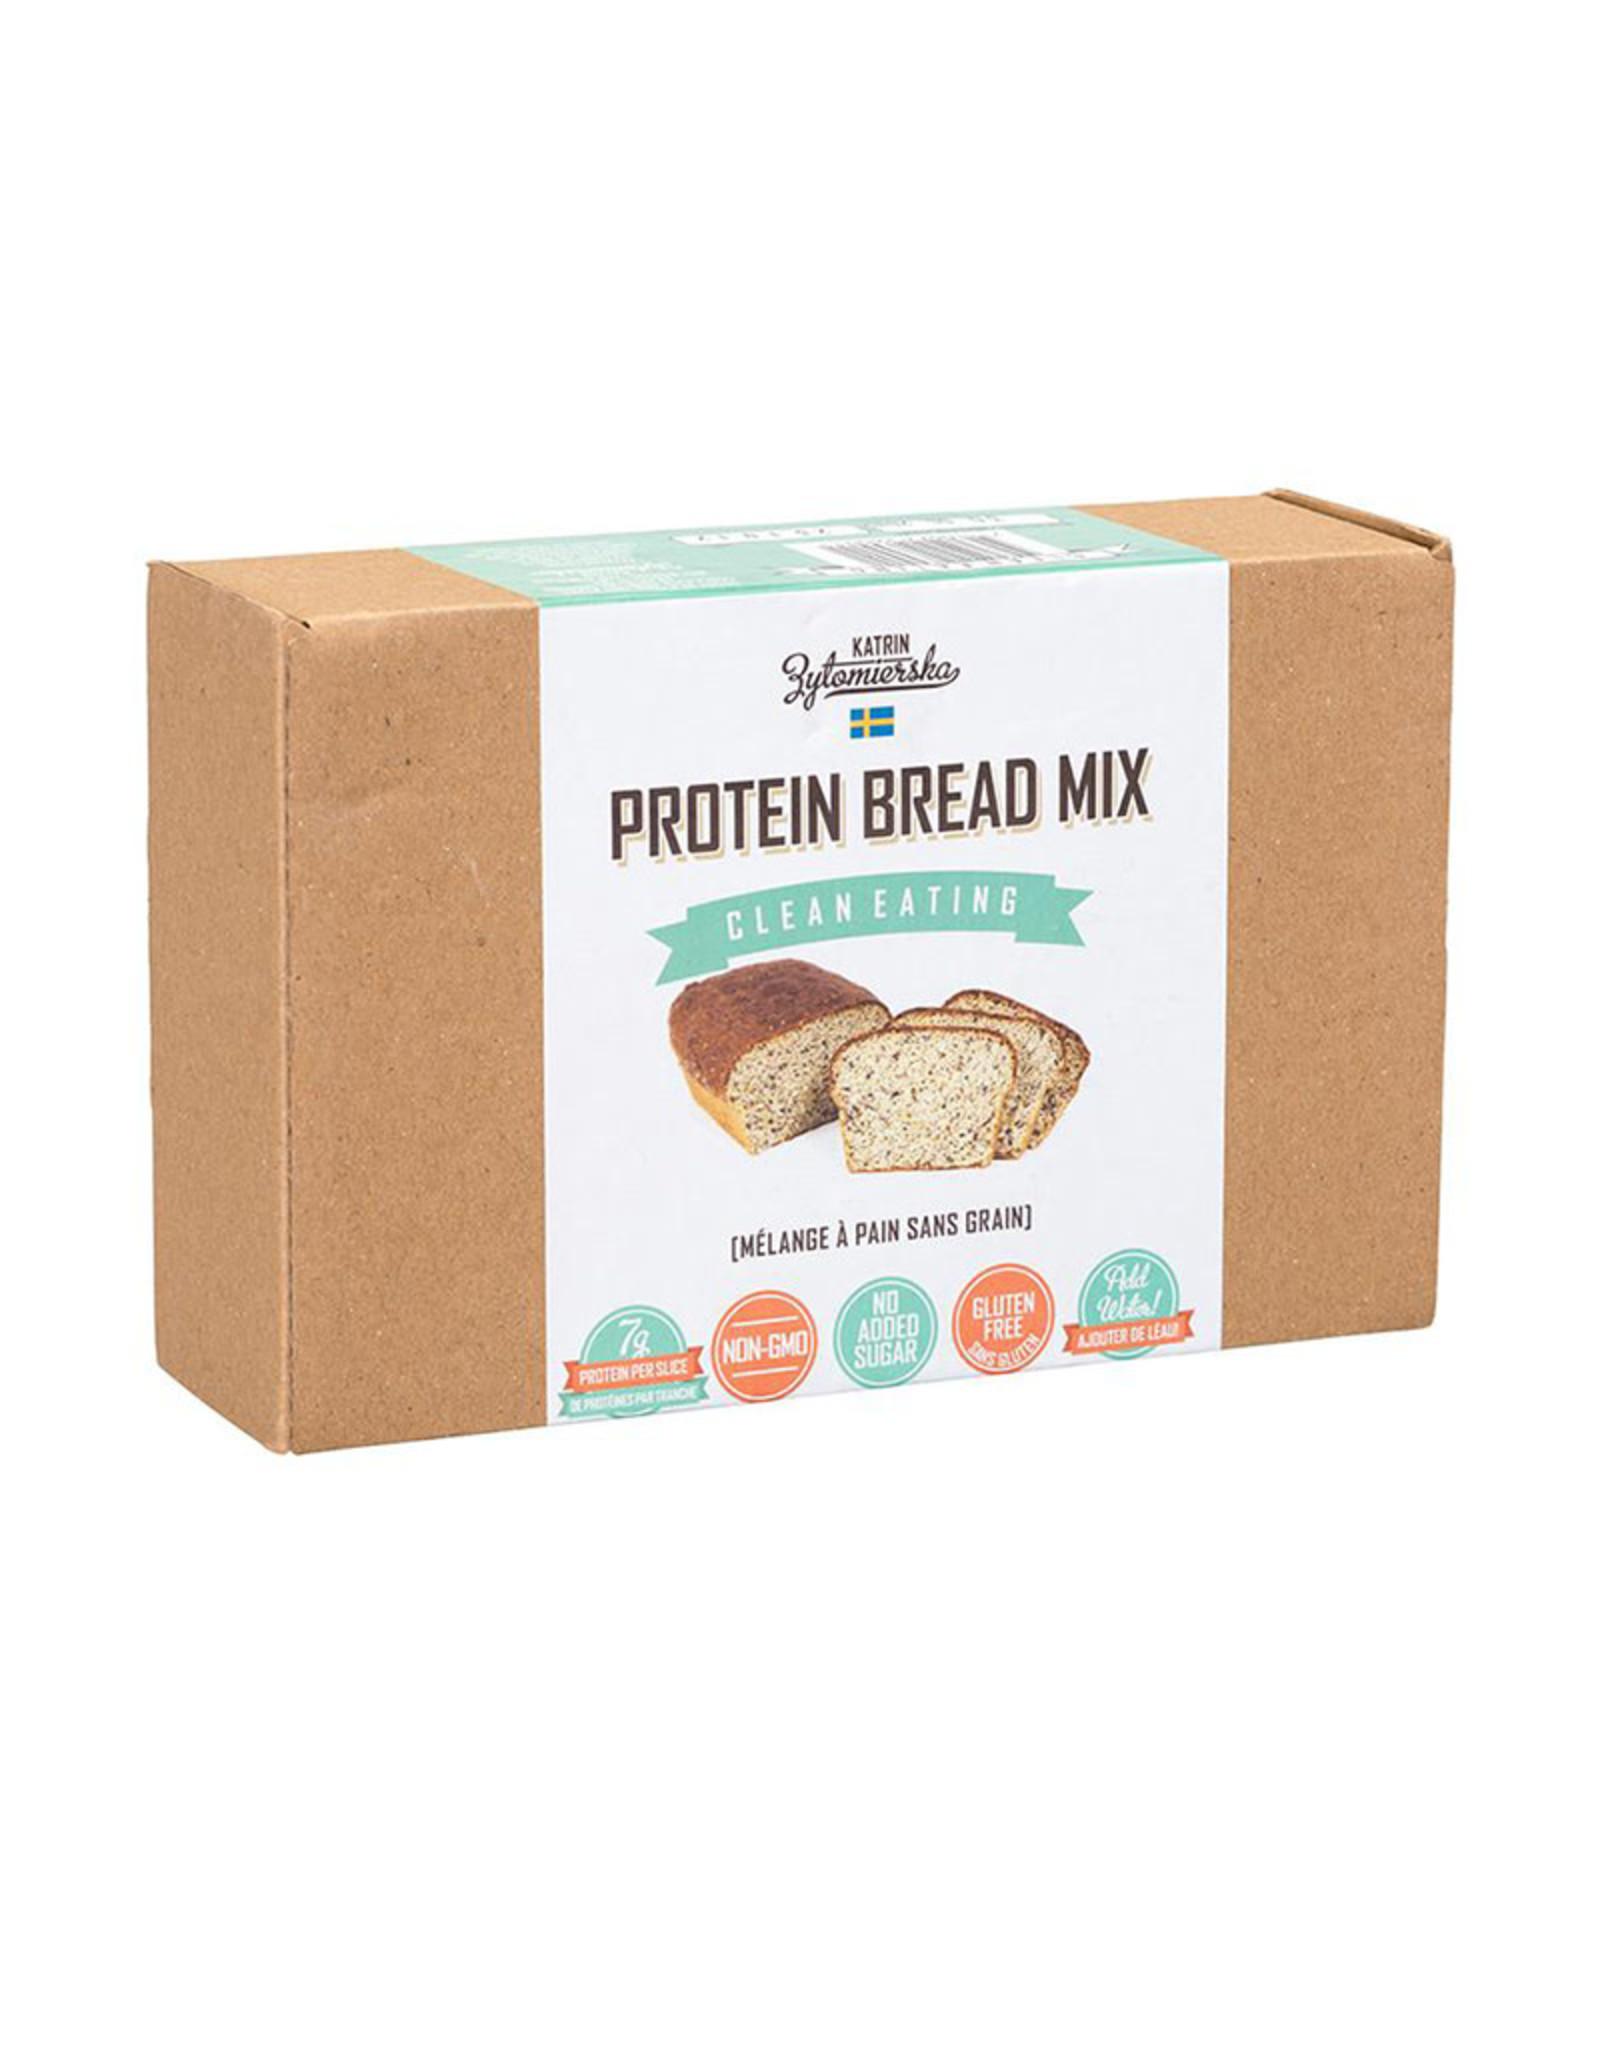 KZ Clean Eating KZ Clean Eating - Grain Free Protein Bread Mix